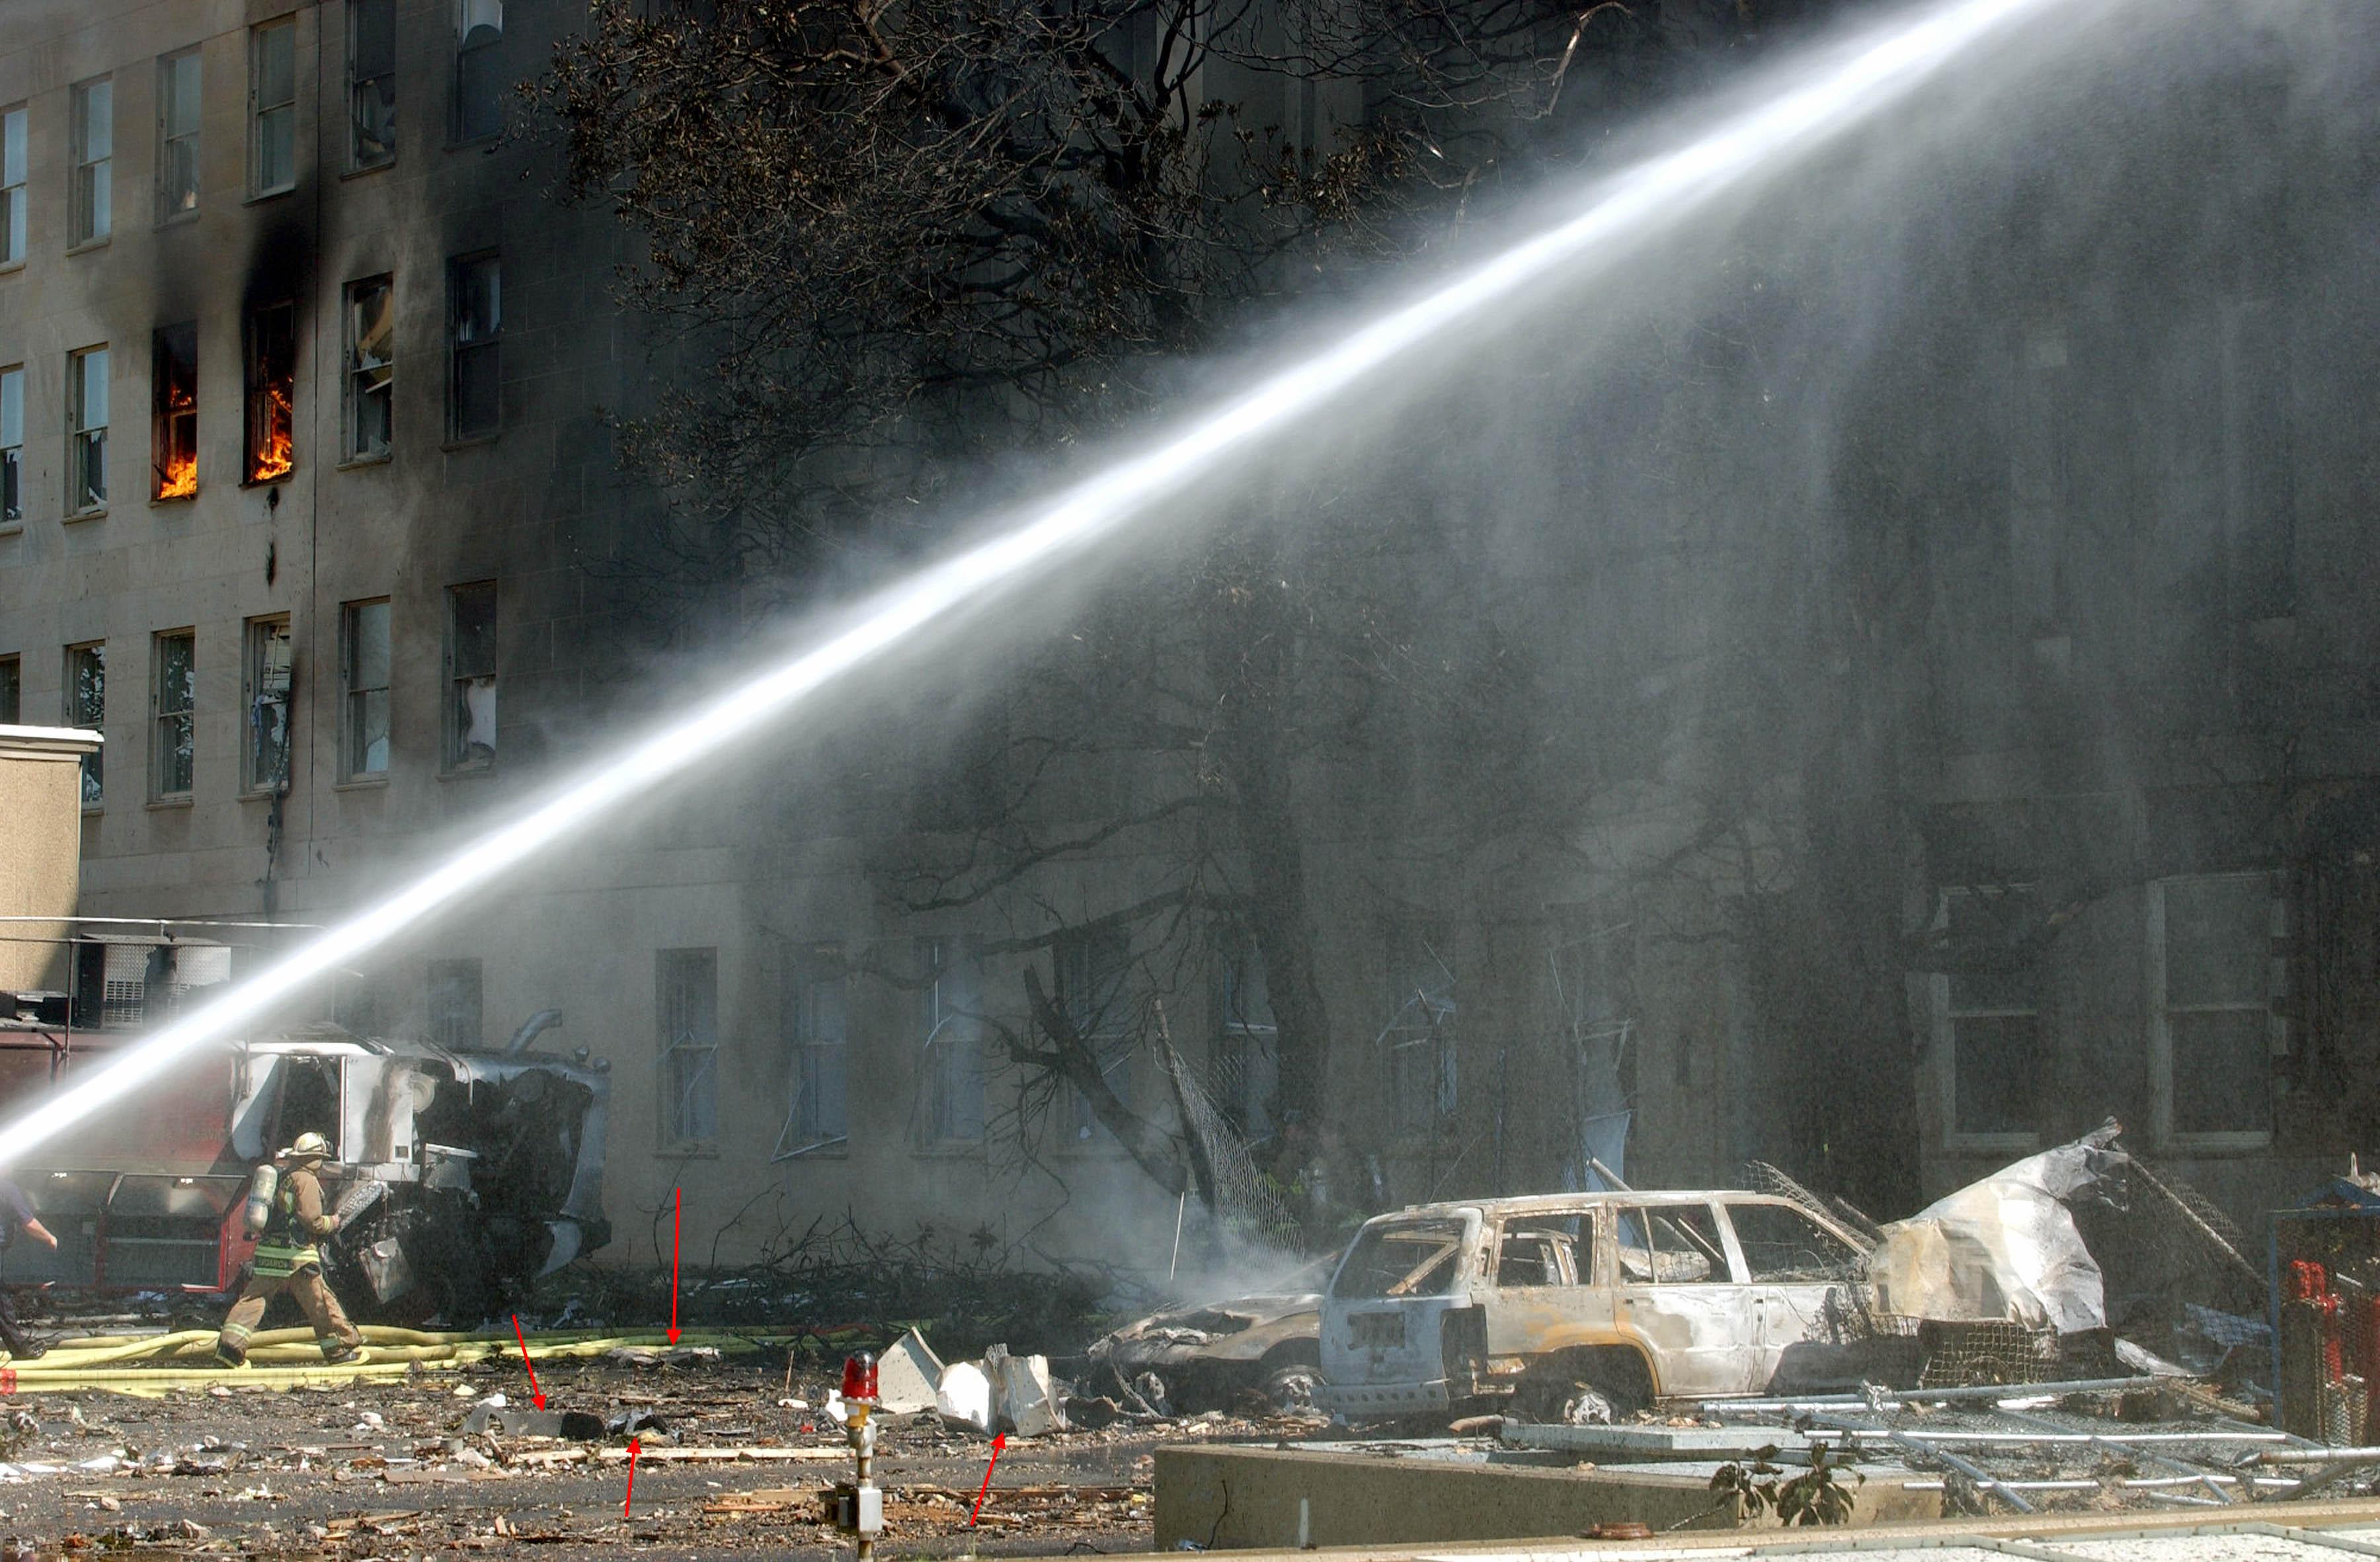 http://fredyz.free.fr/911/debris/morc7.jpg